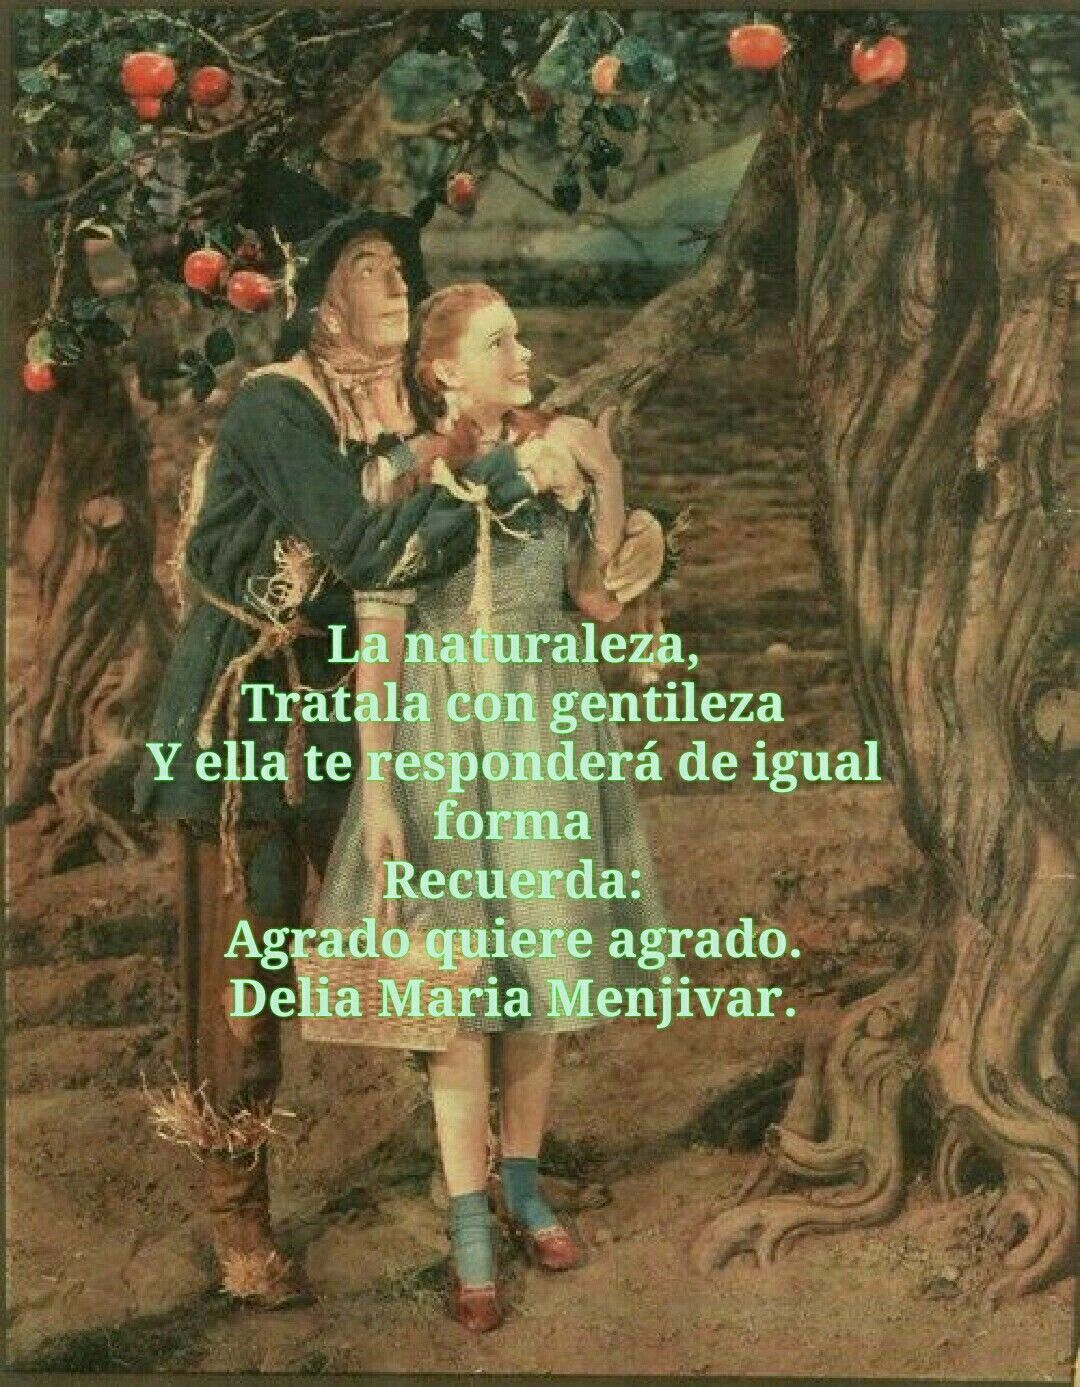 Pin By Delia Maria Menjivar On Dorothy Por Siempre